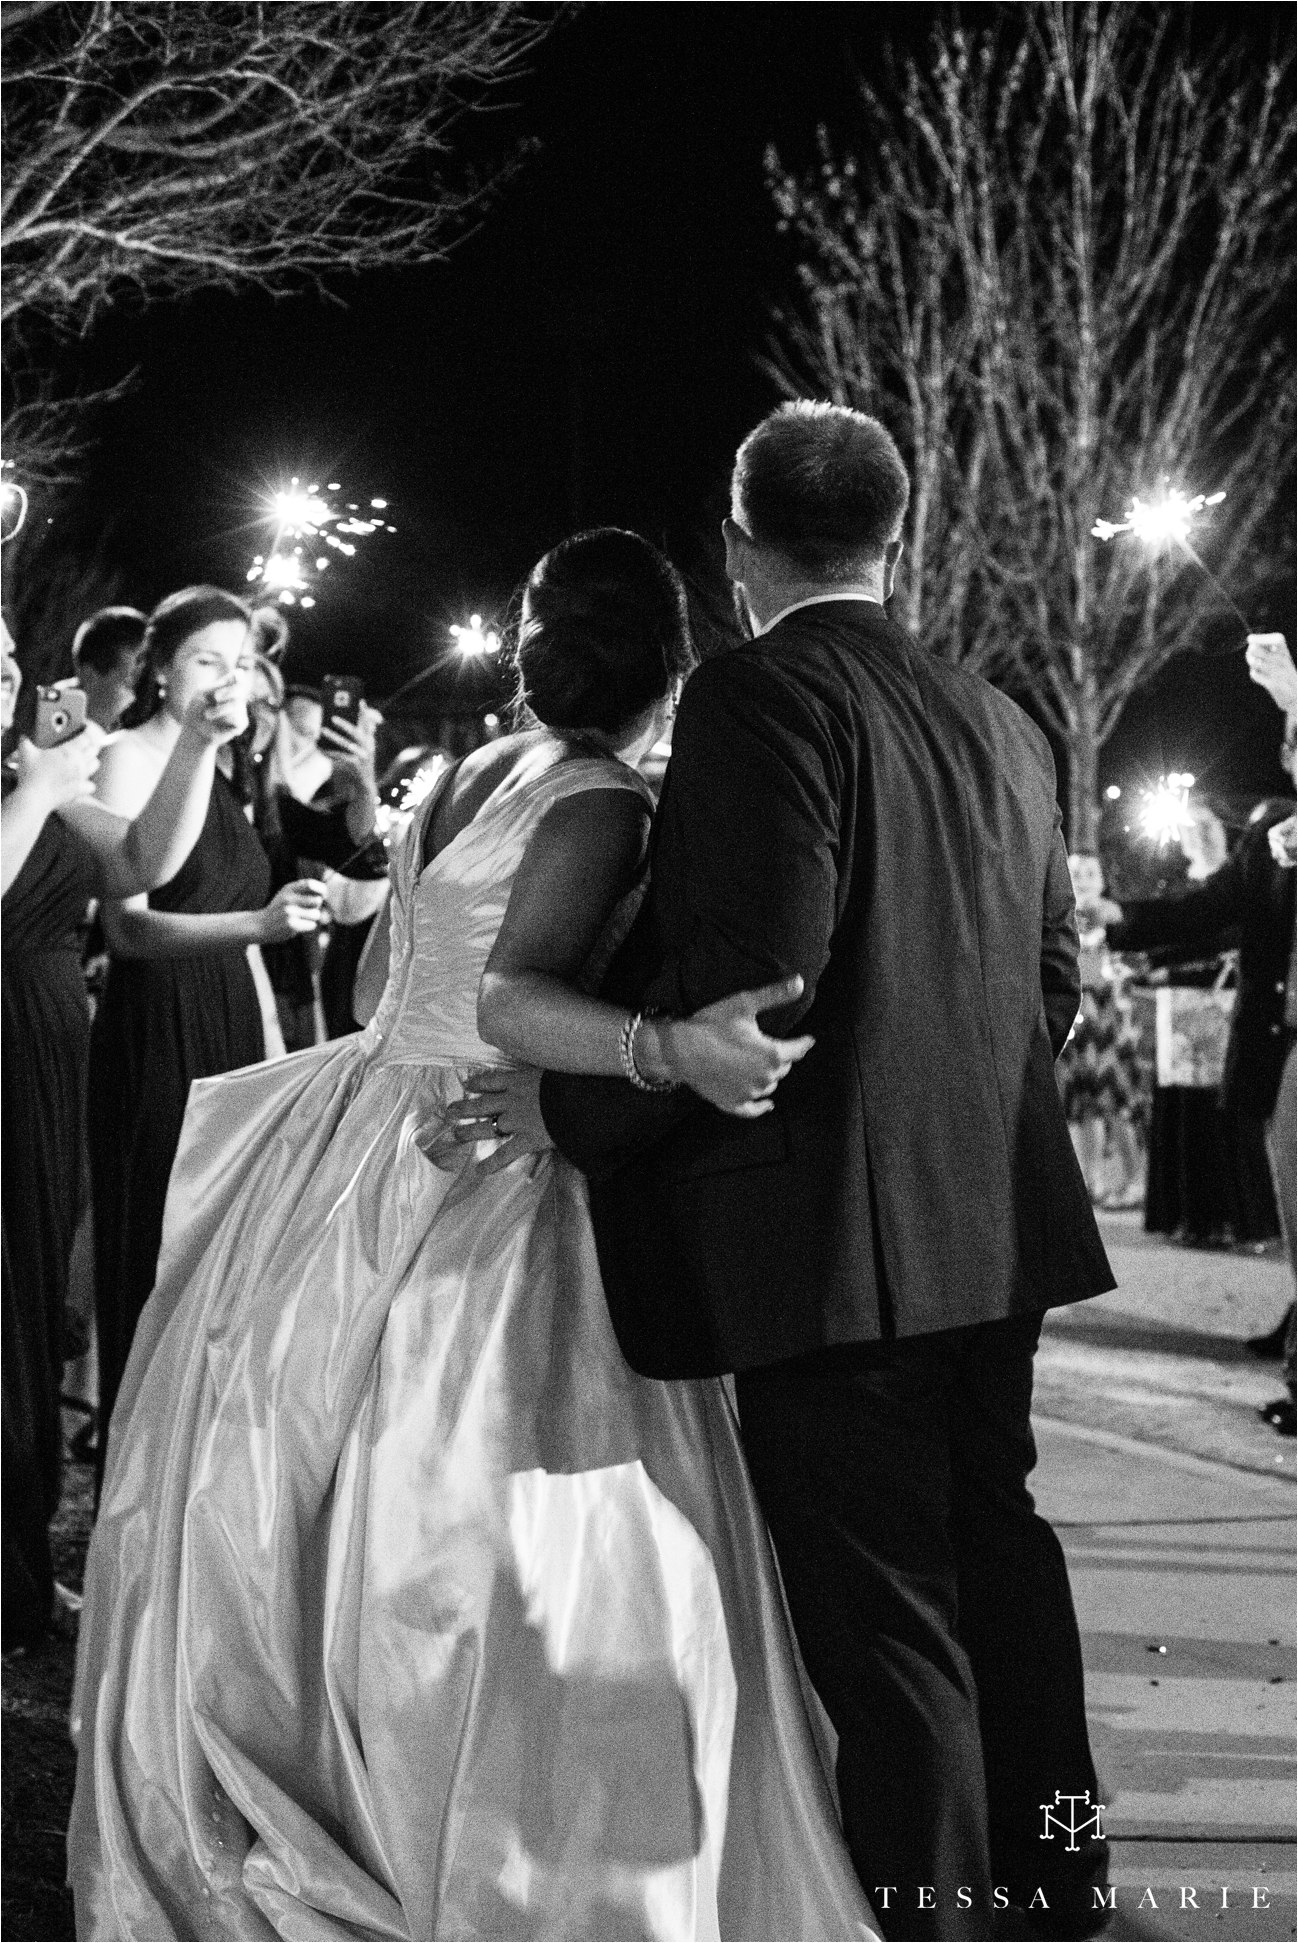 tessa_marie_weddings_wedding_moments_Tessa_marie_studios_0181